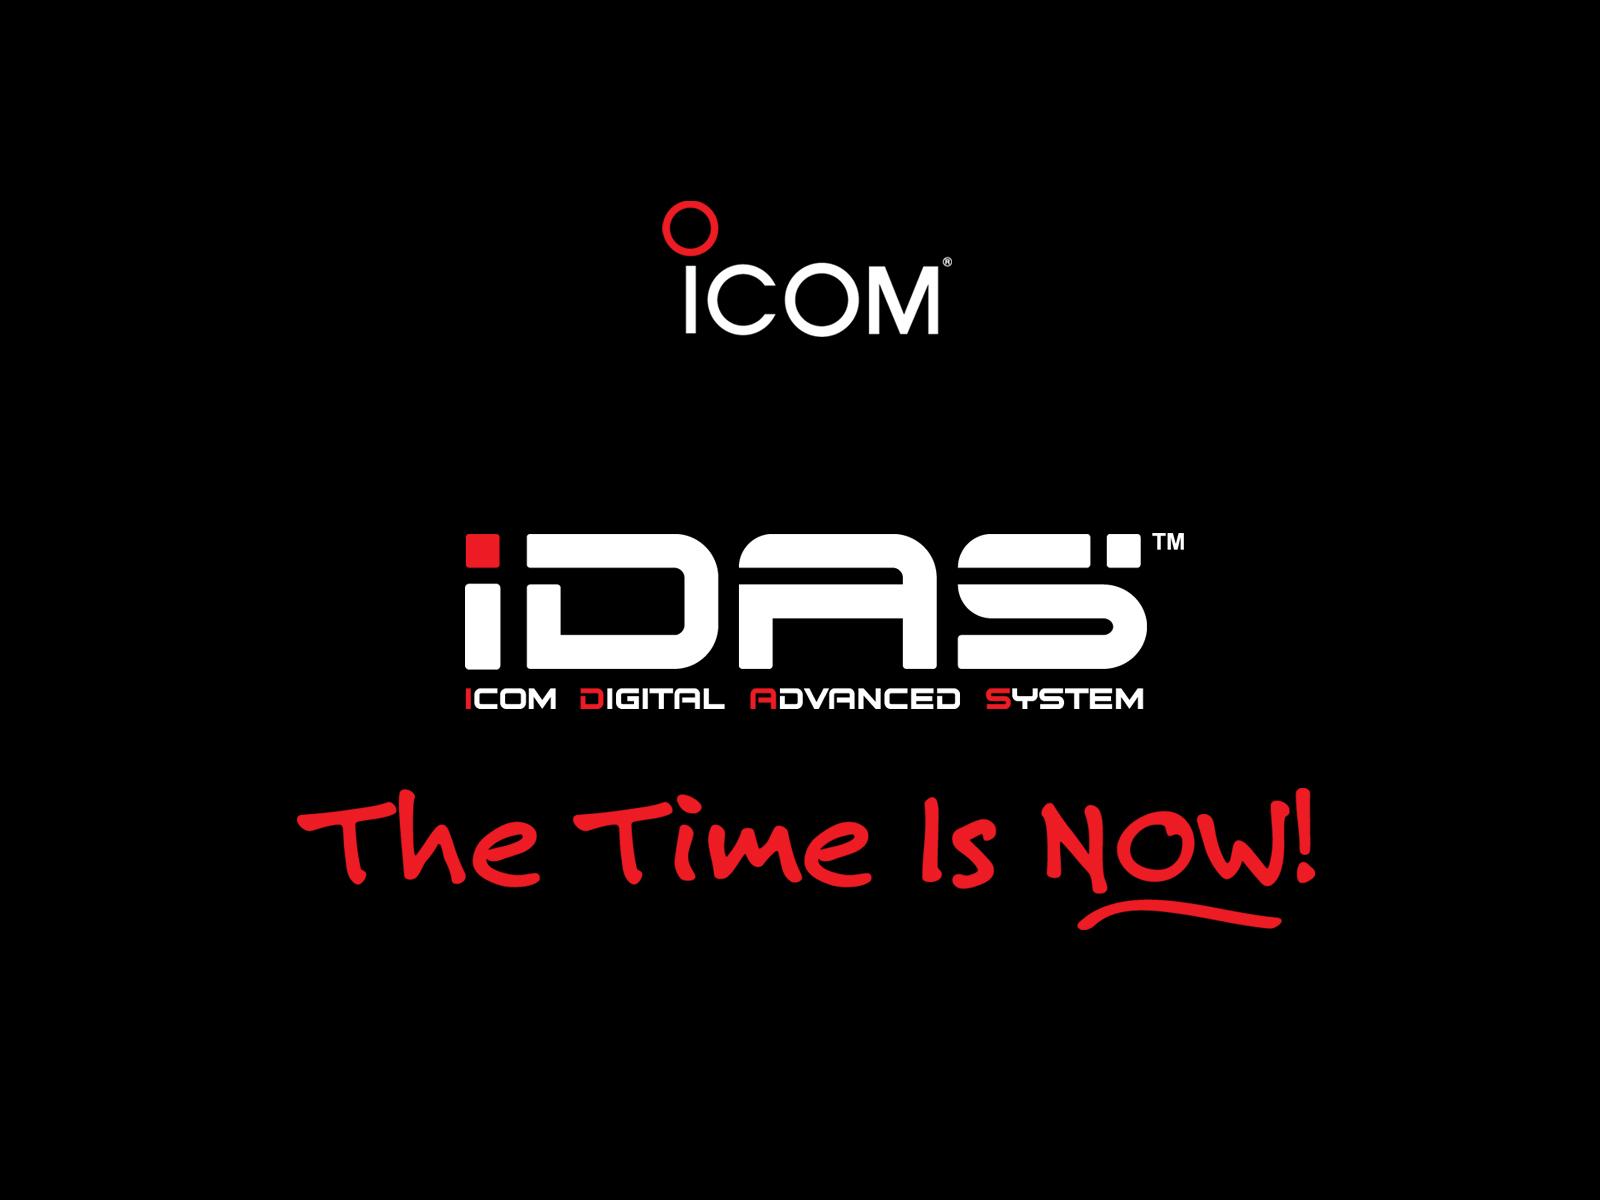 ICOM IDAS Charter School case study